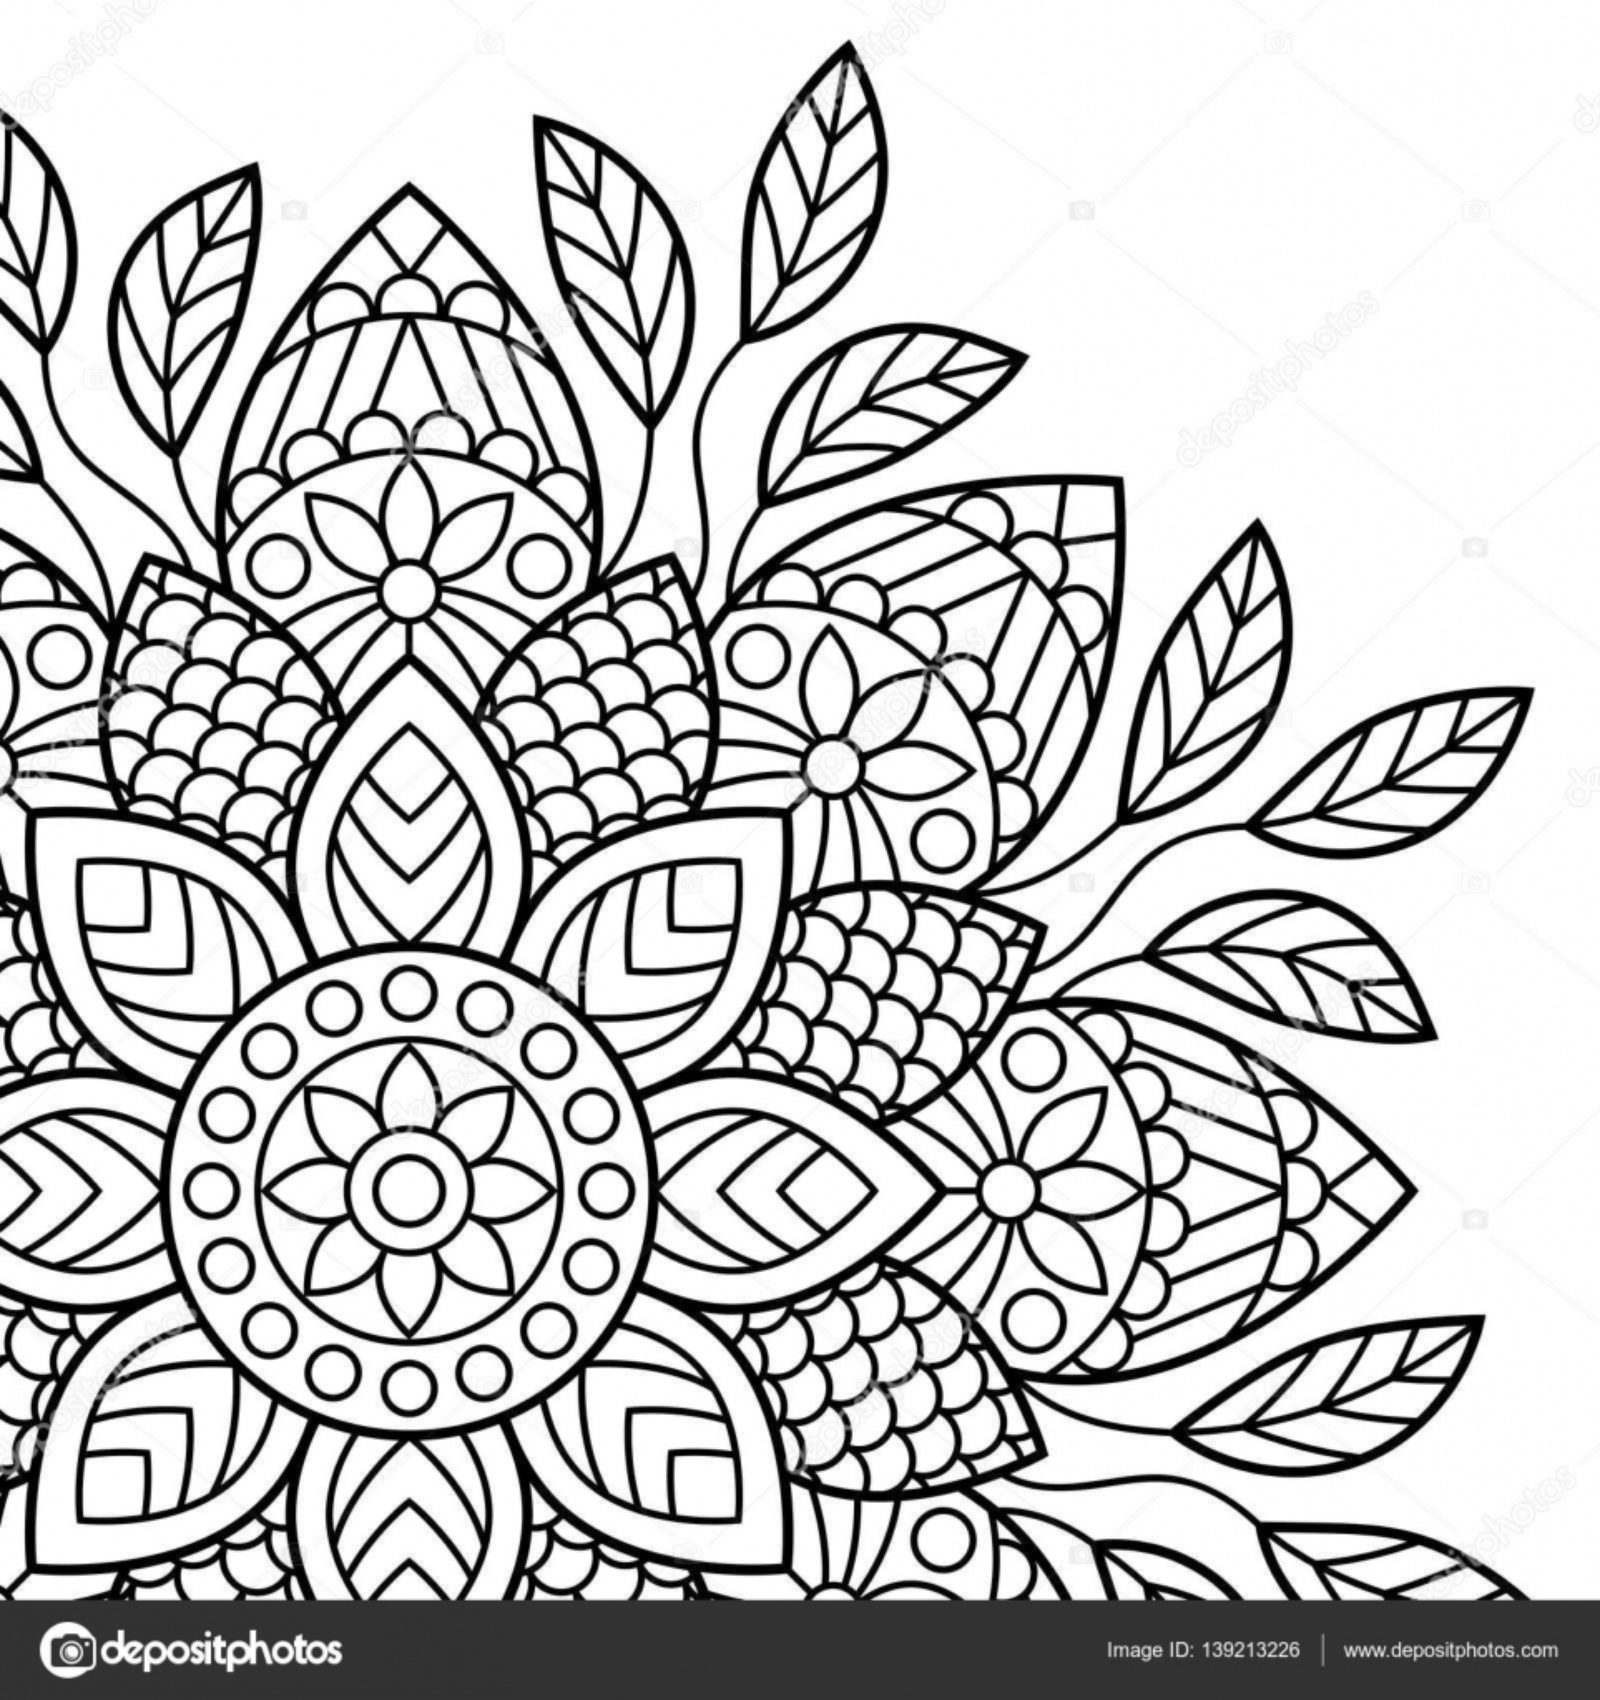 Mandala. Malvorlagen Buch — Stockvektor © jelisua88 #139213226